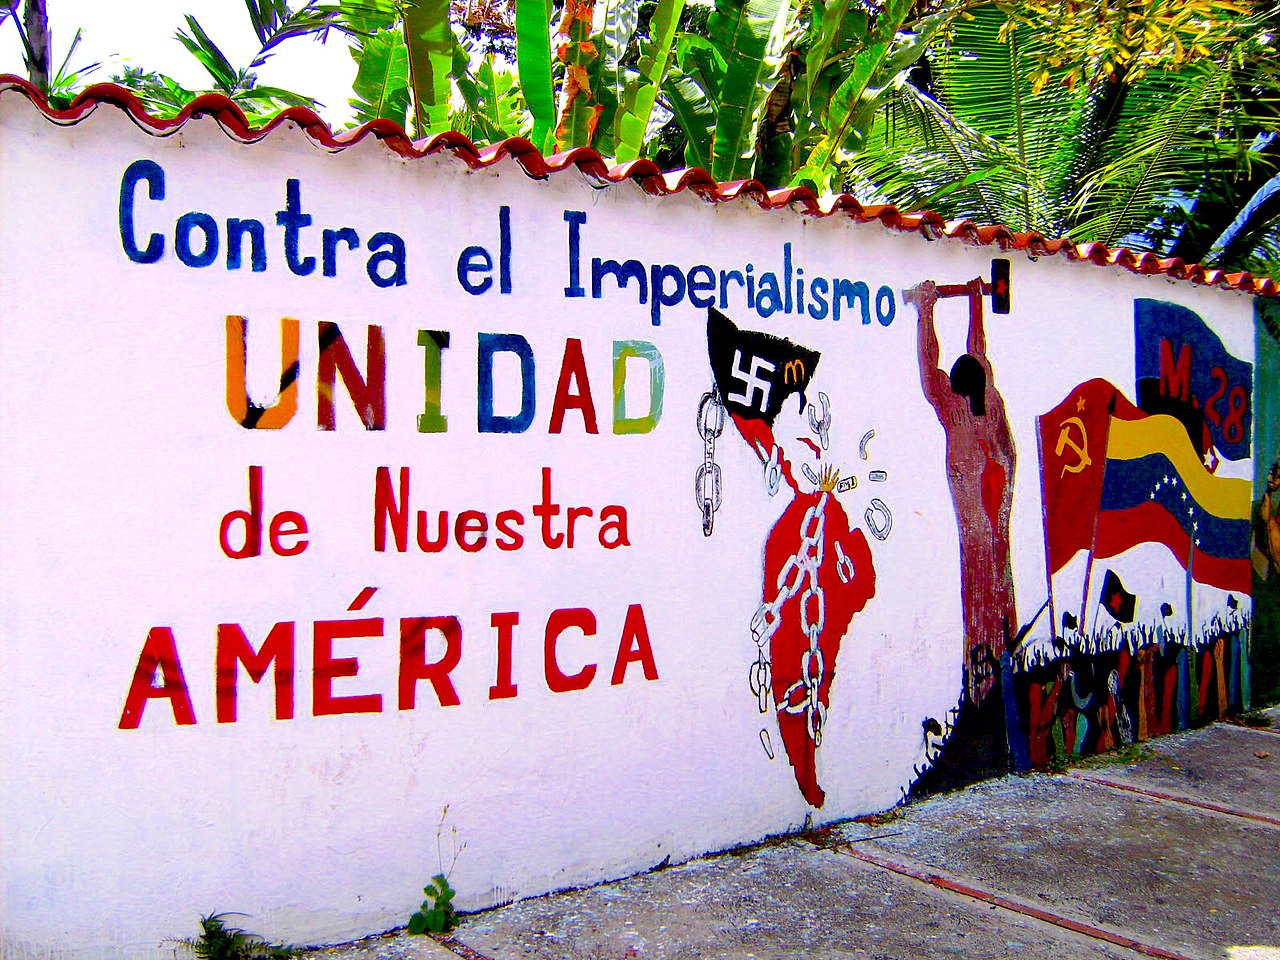 Bolivarian mural against Imperialism & United States.jpg